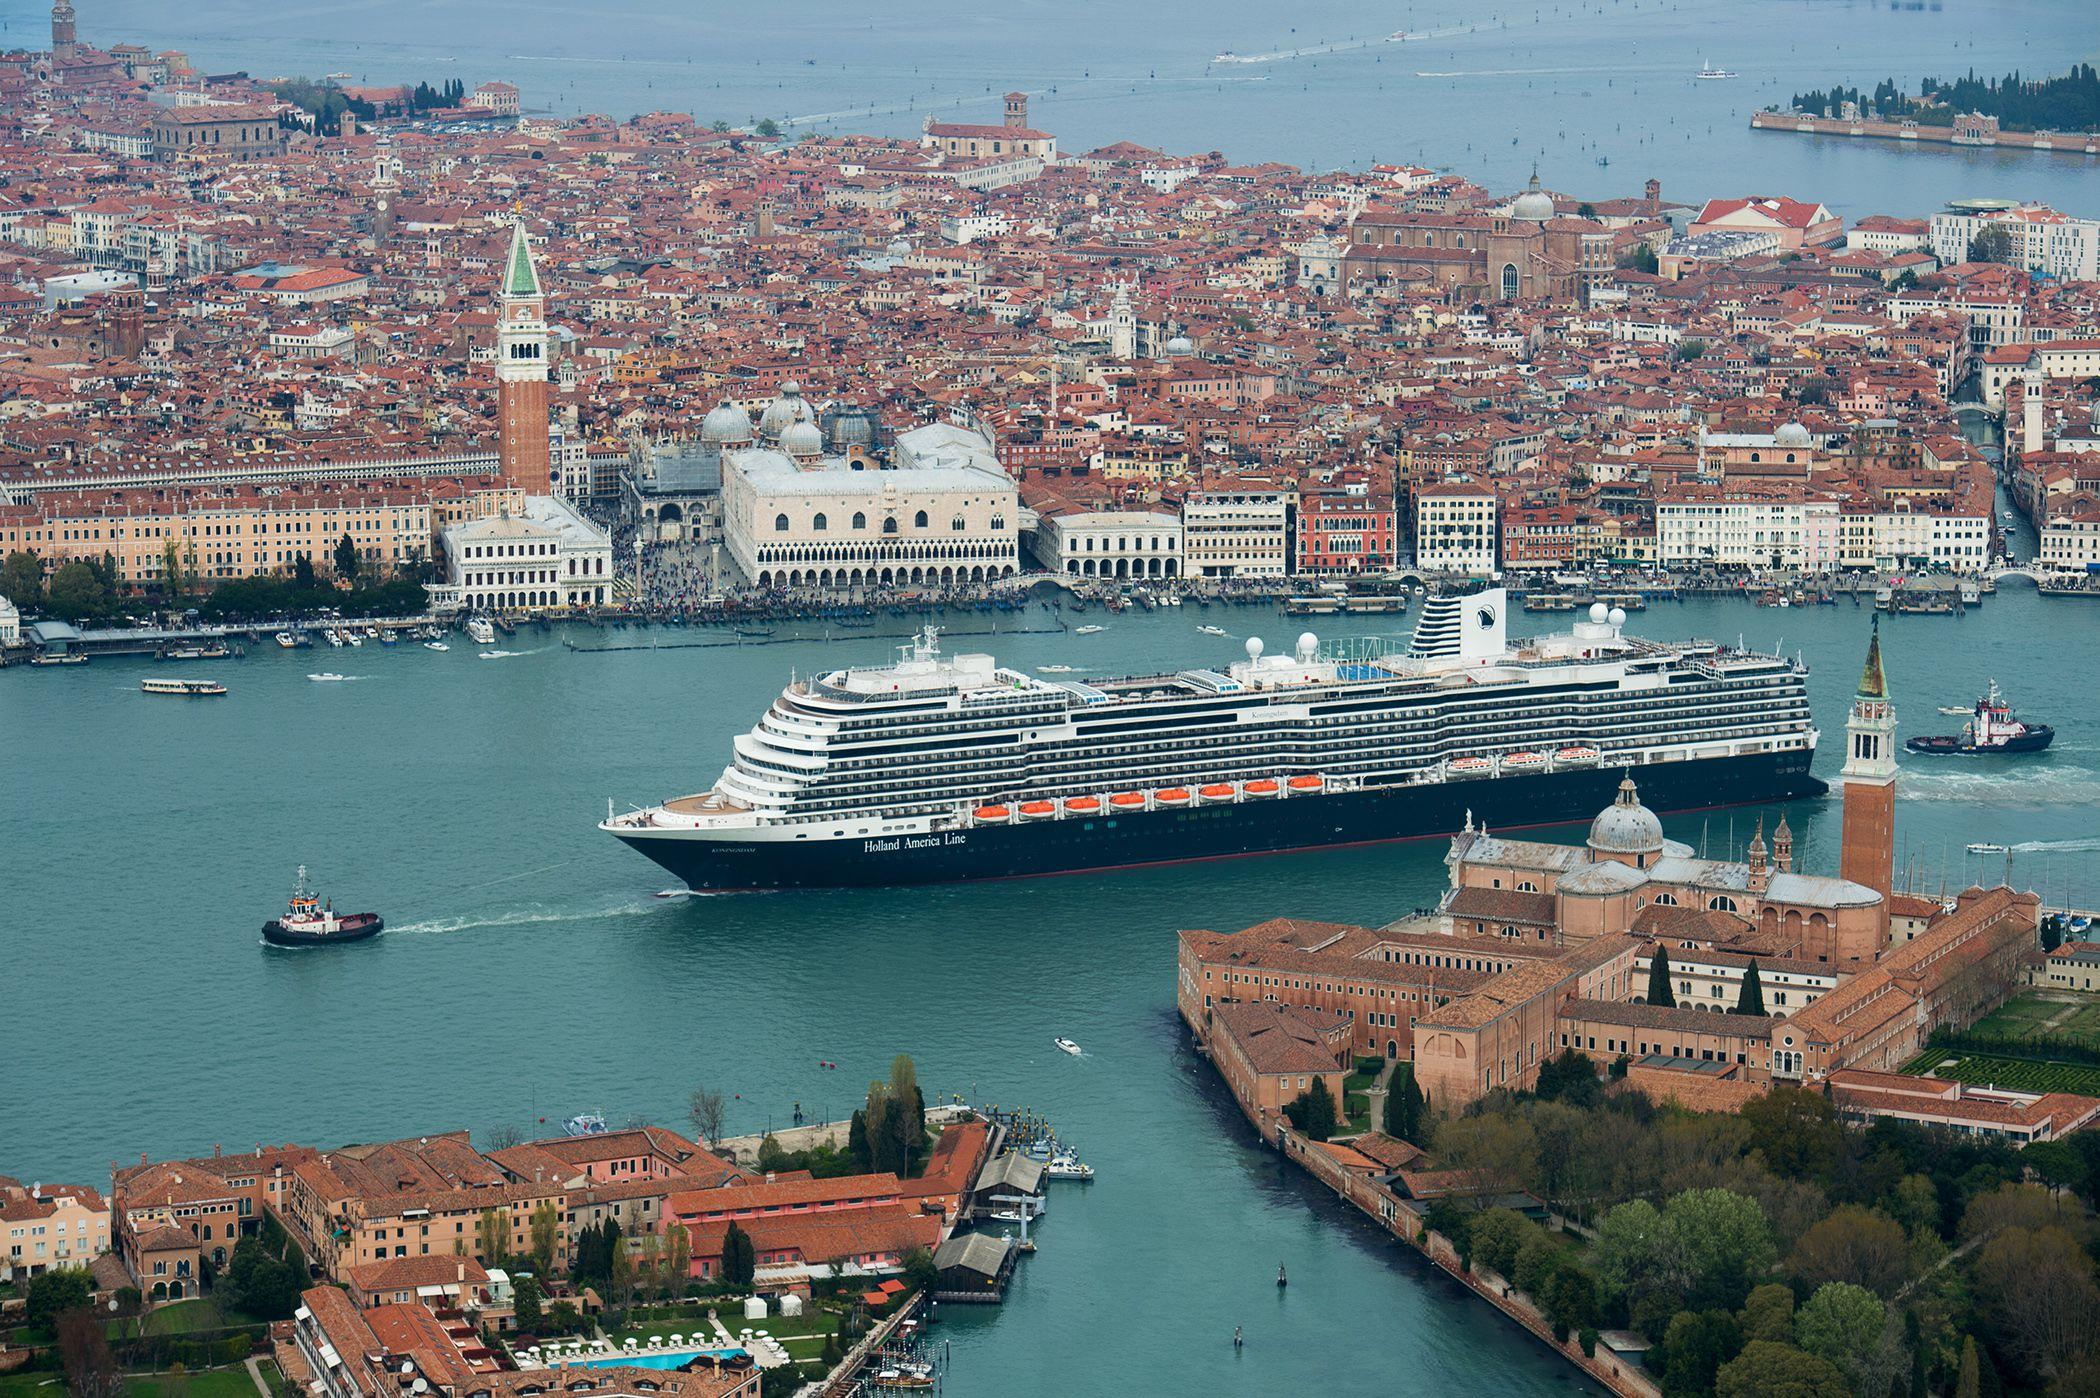 Holland America Line Ms Koningsdam Cruise Ship Profile